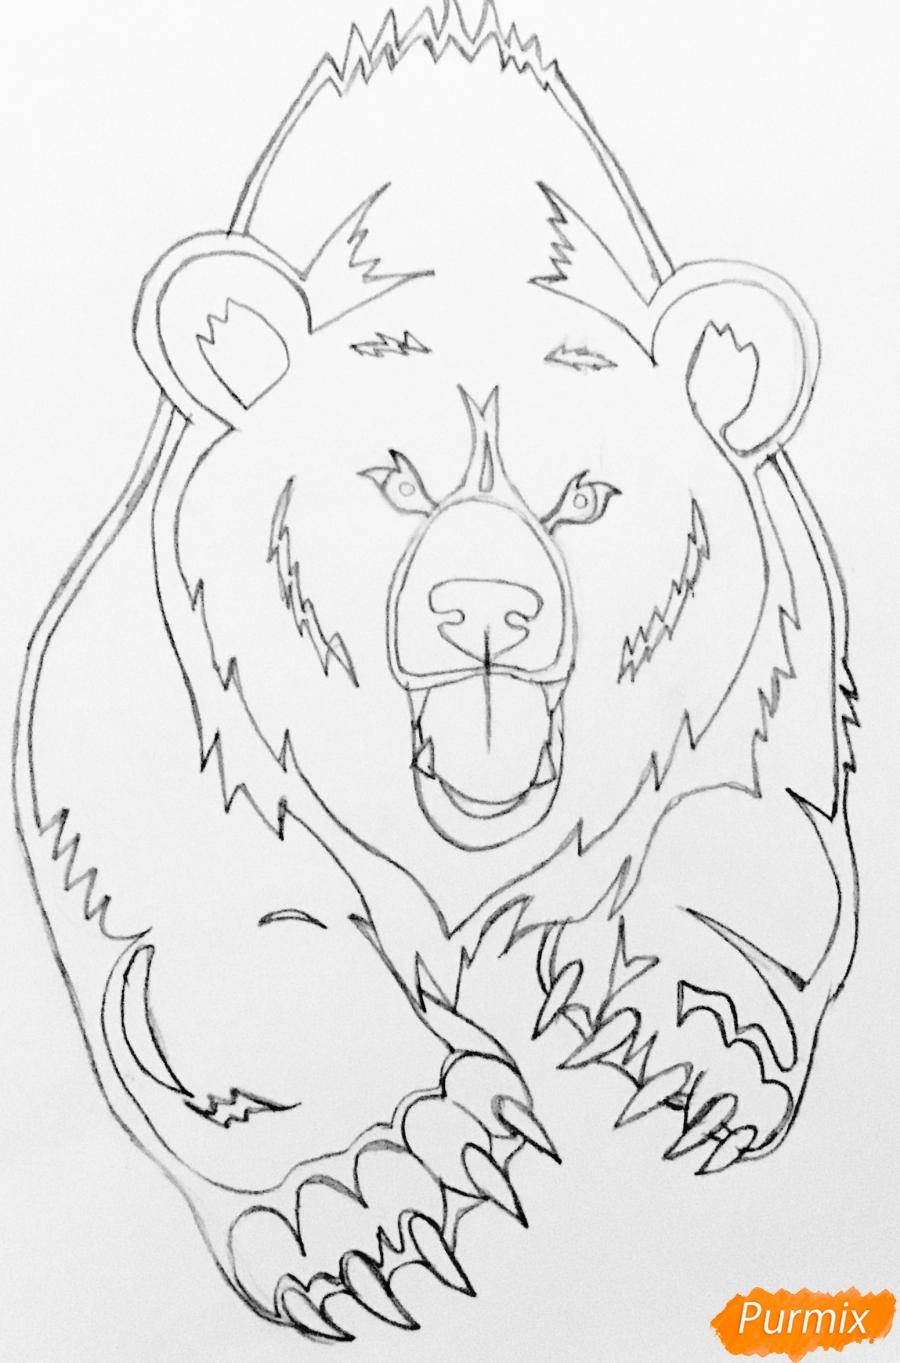 Рисуем медведя в стиле тату - шаг 6